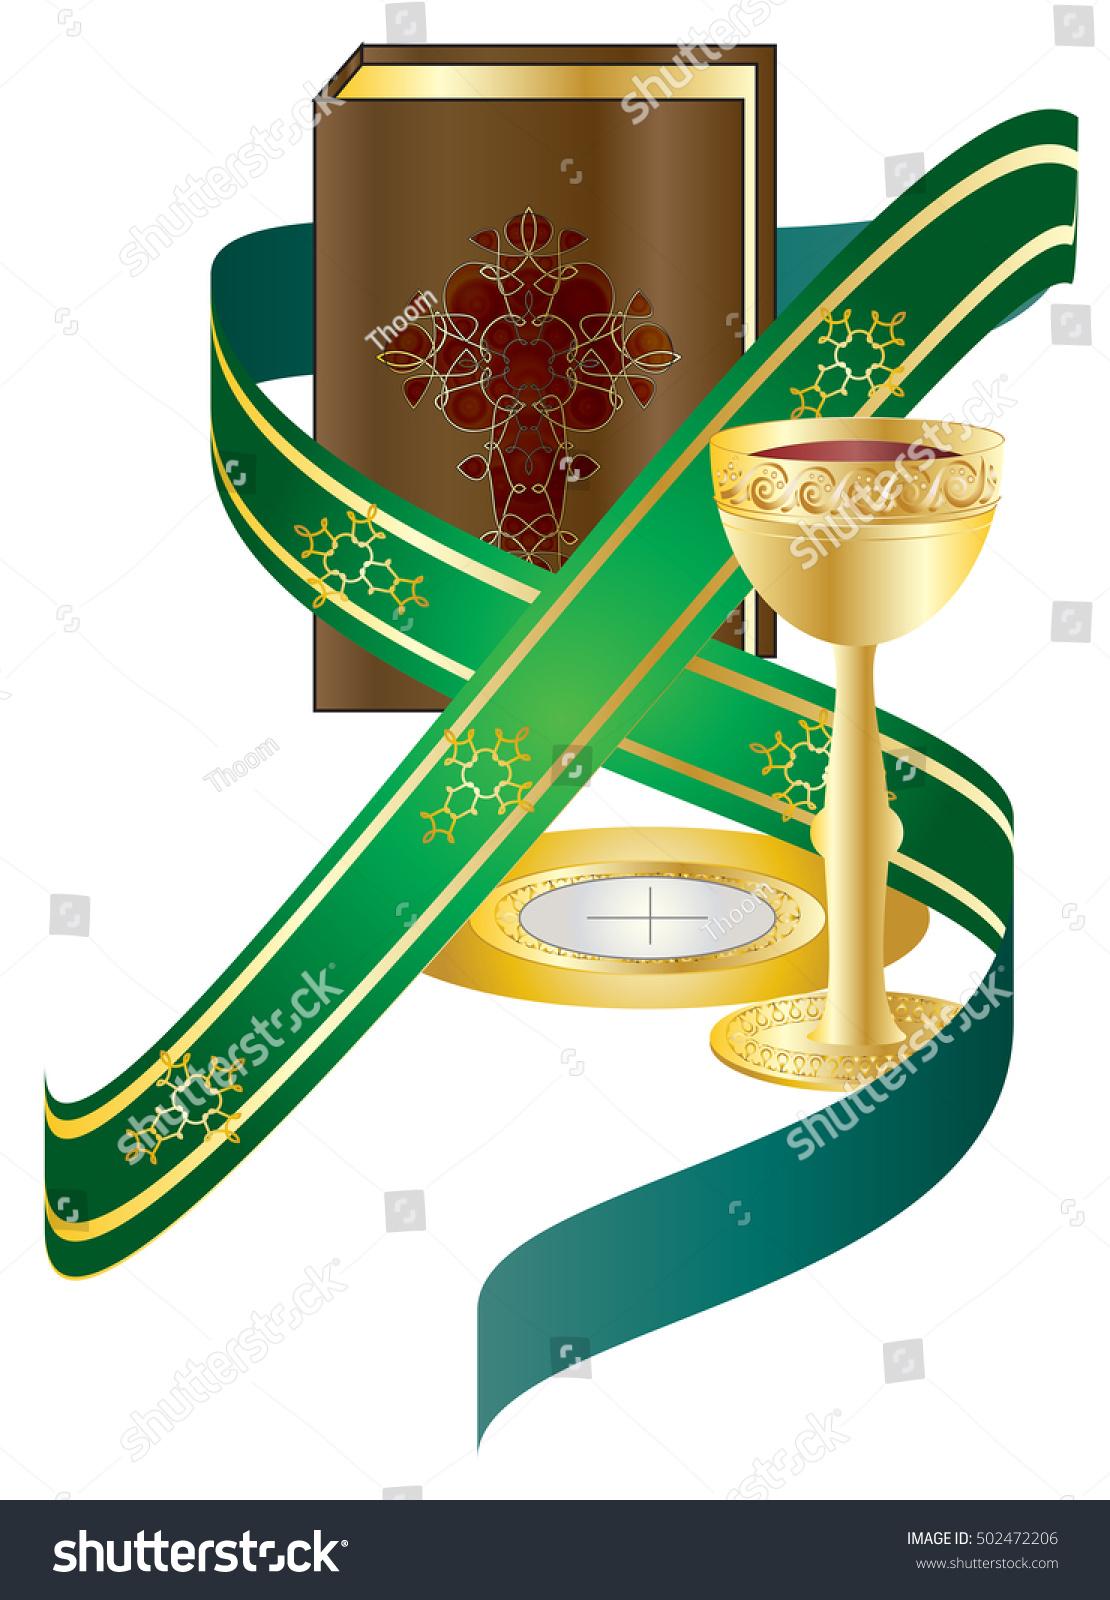 Holy Orders Sacrament Religious Vector Illustration Stock Vector